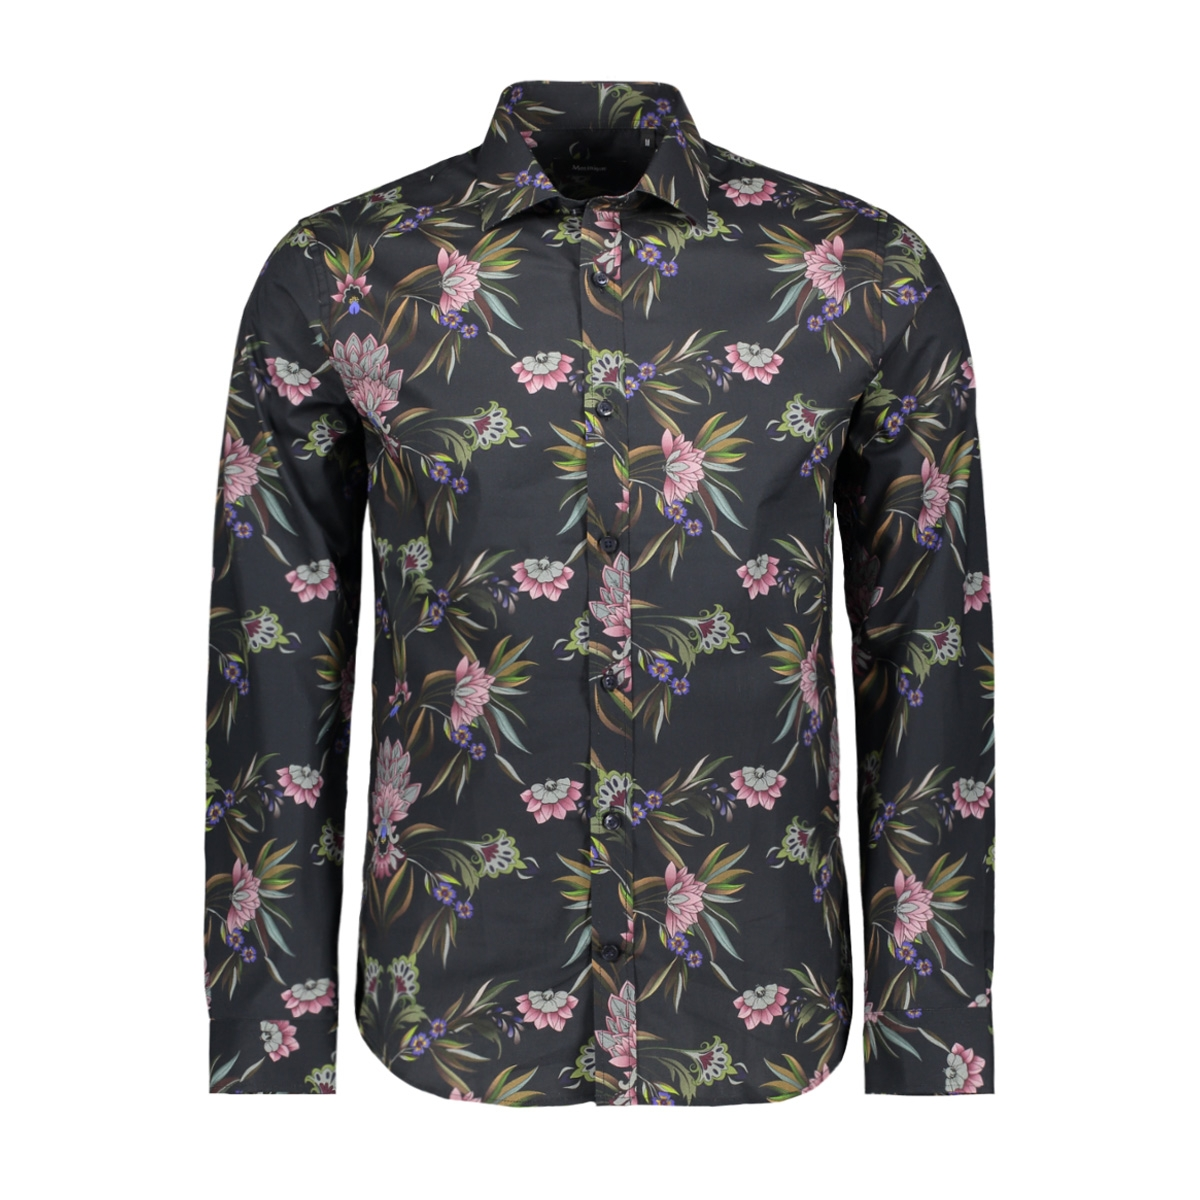 30203110 matinique overhemd 20291